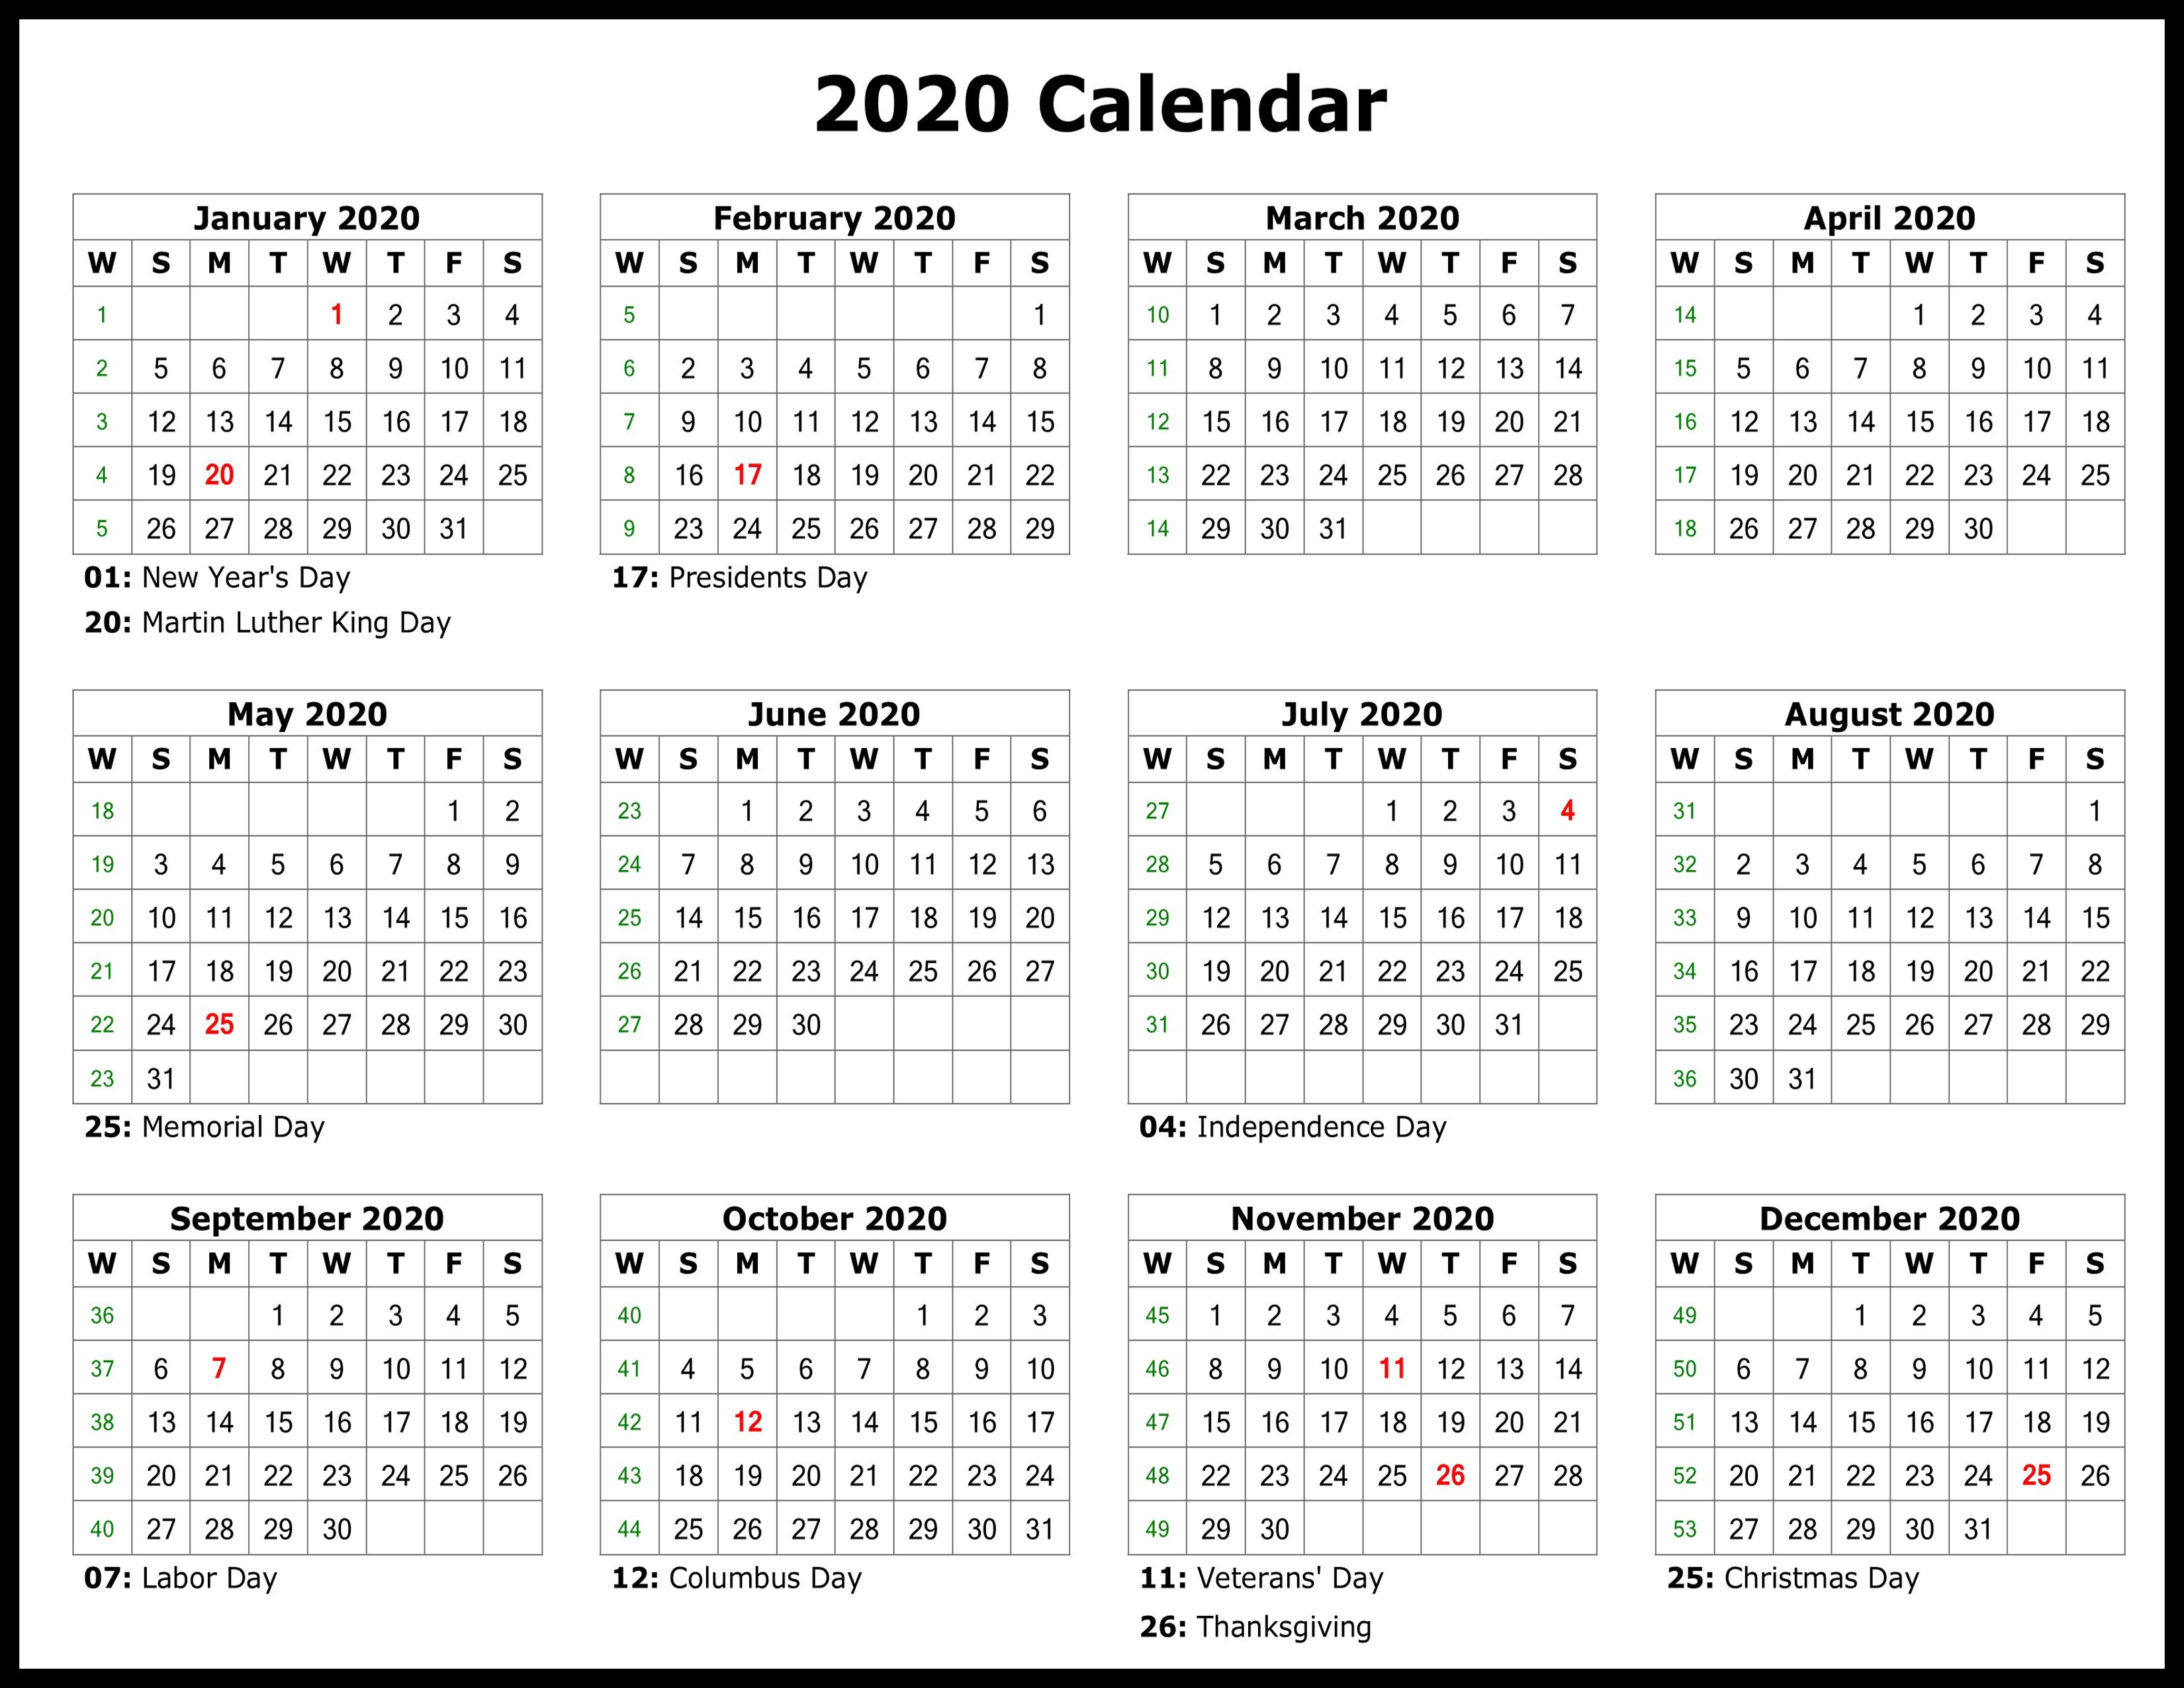 Free 12 Month Calendar 2020 Printable | Printable Calendar with regard to Printable 12 Month 2020 Calendar